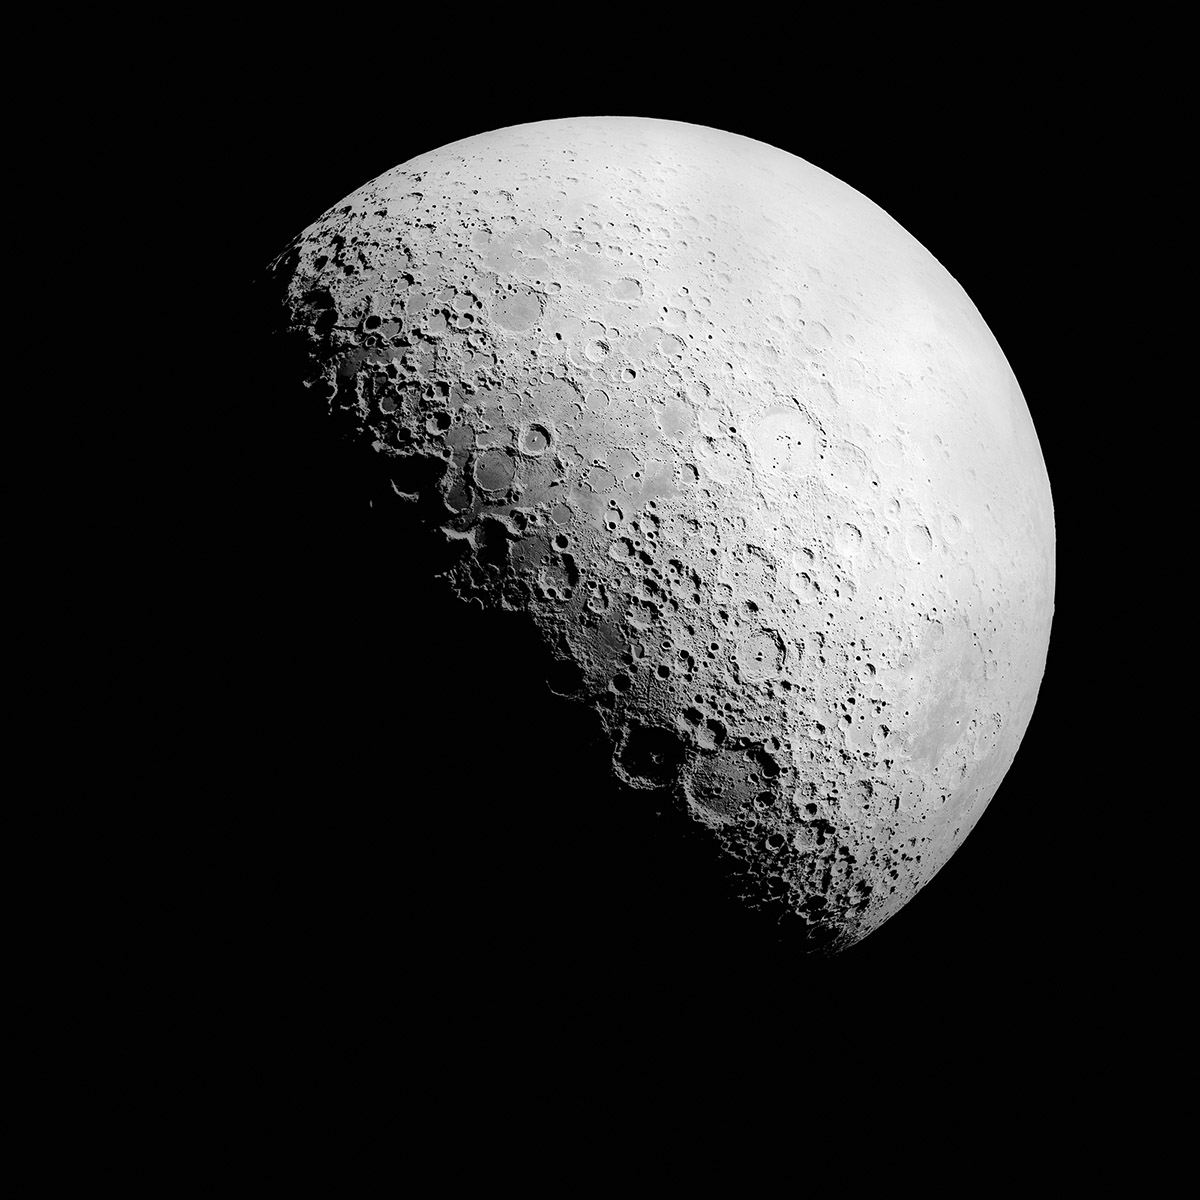 Alain Ricard Photography - NASA JSC Electronic Imagery